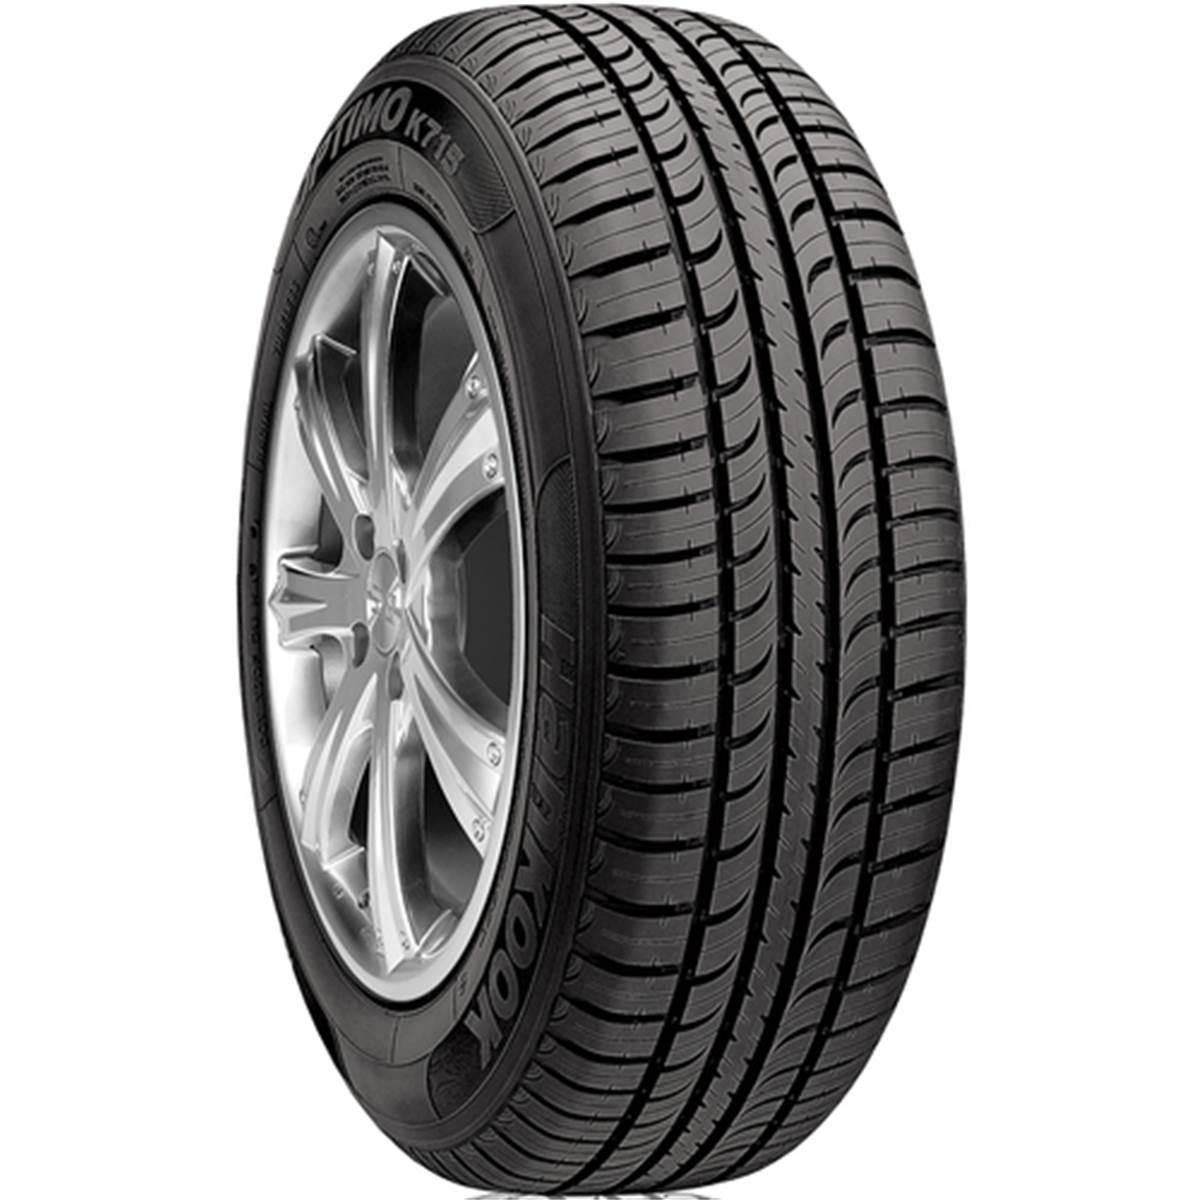 Hankook Optimo K715 pneu